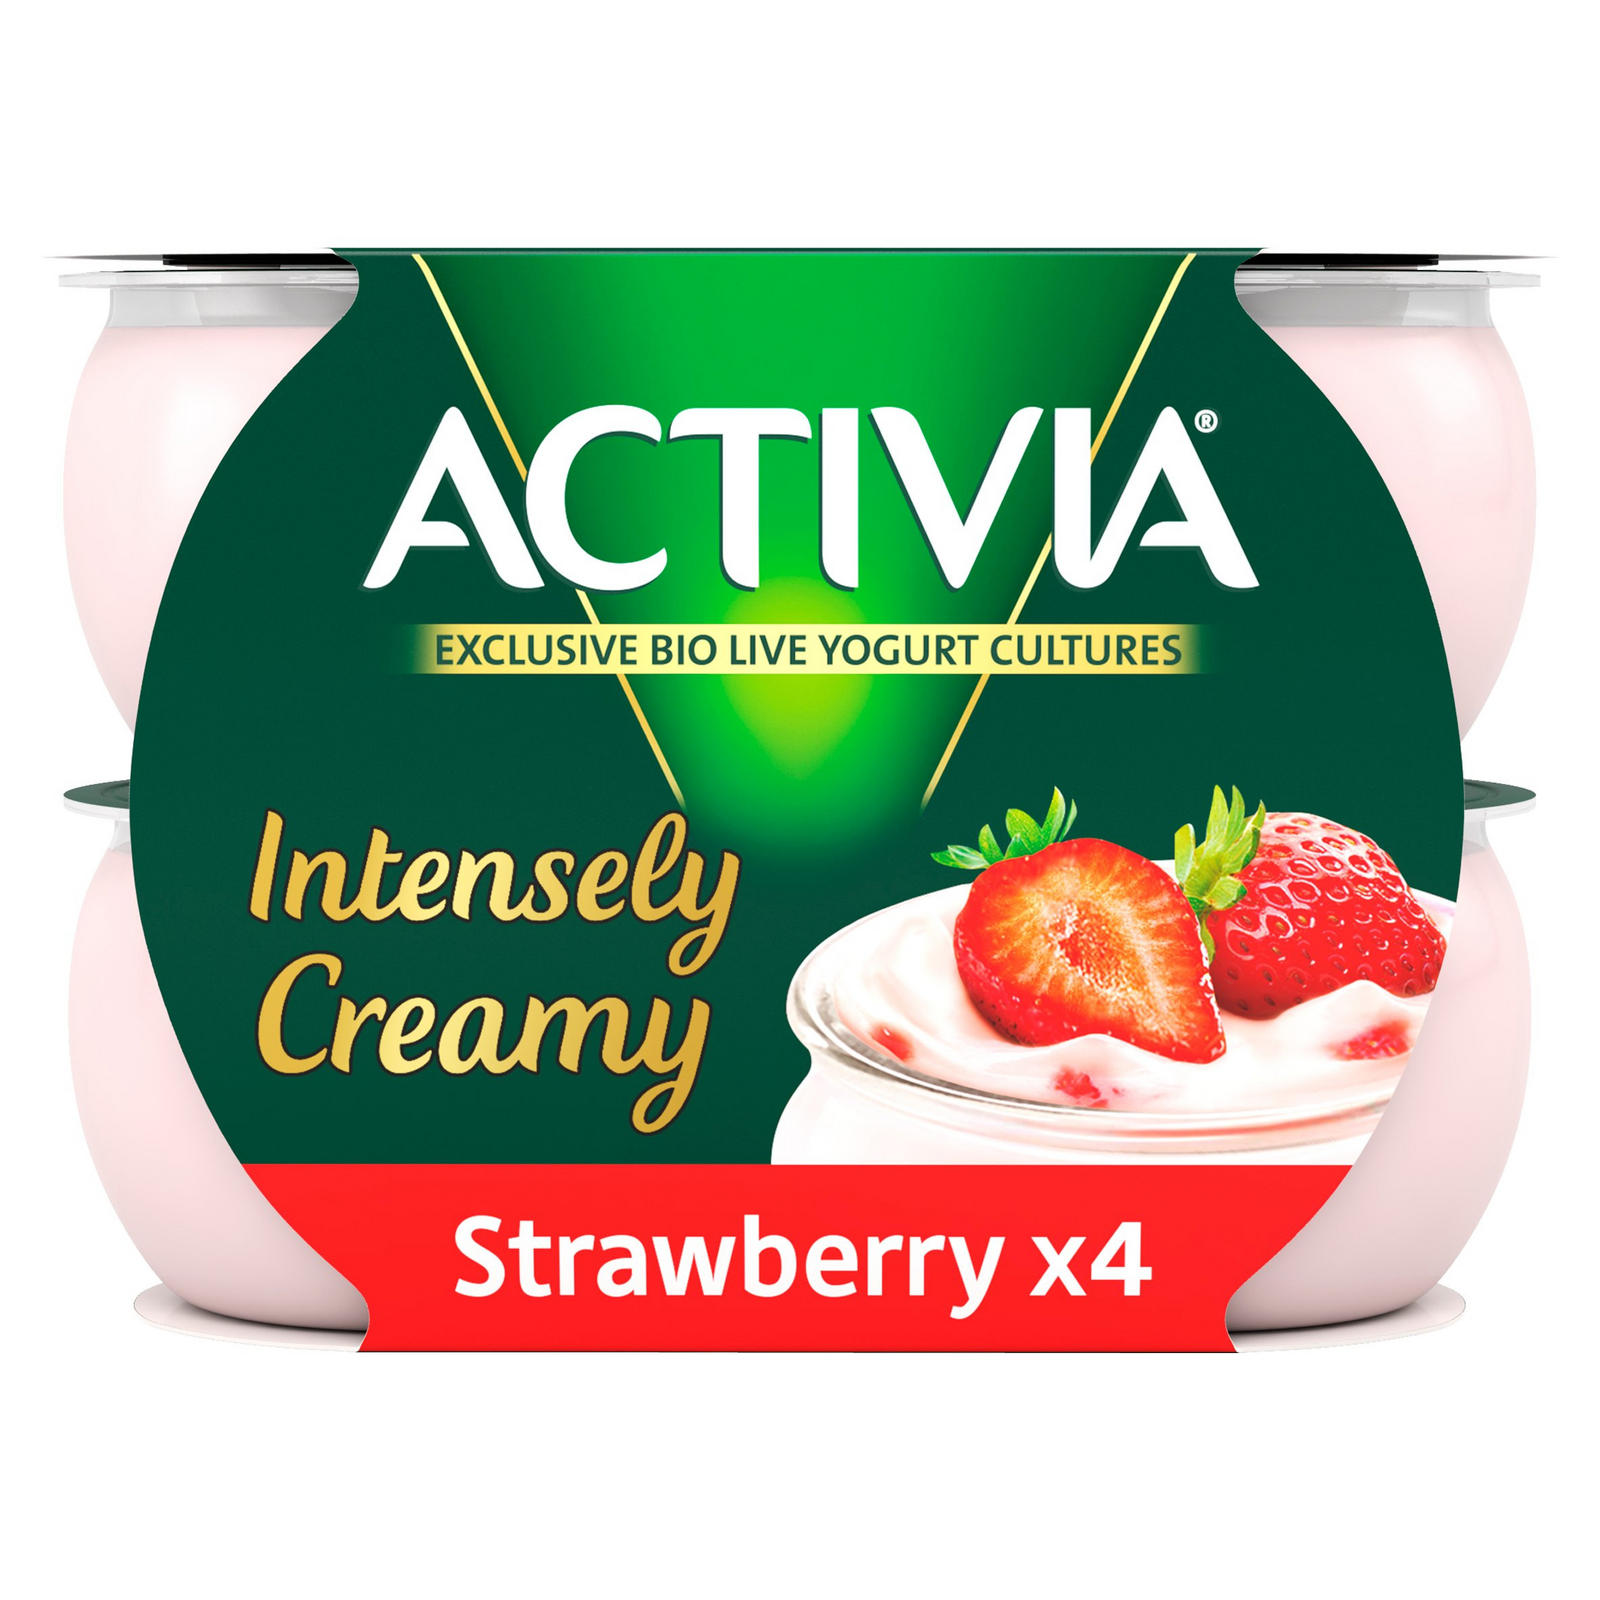 Activia Intensely Creamy Greek Style Strawberry Yogurt 4 x 110g (440g)